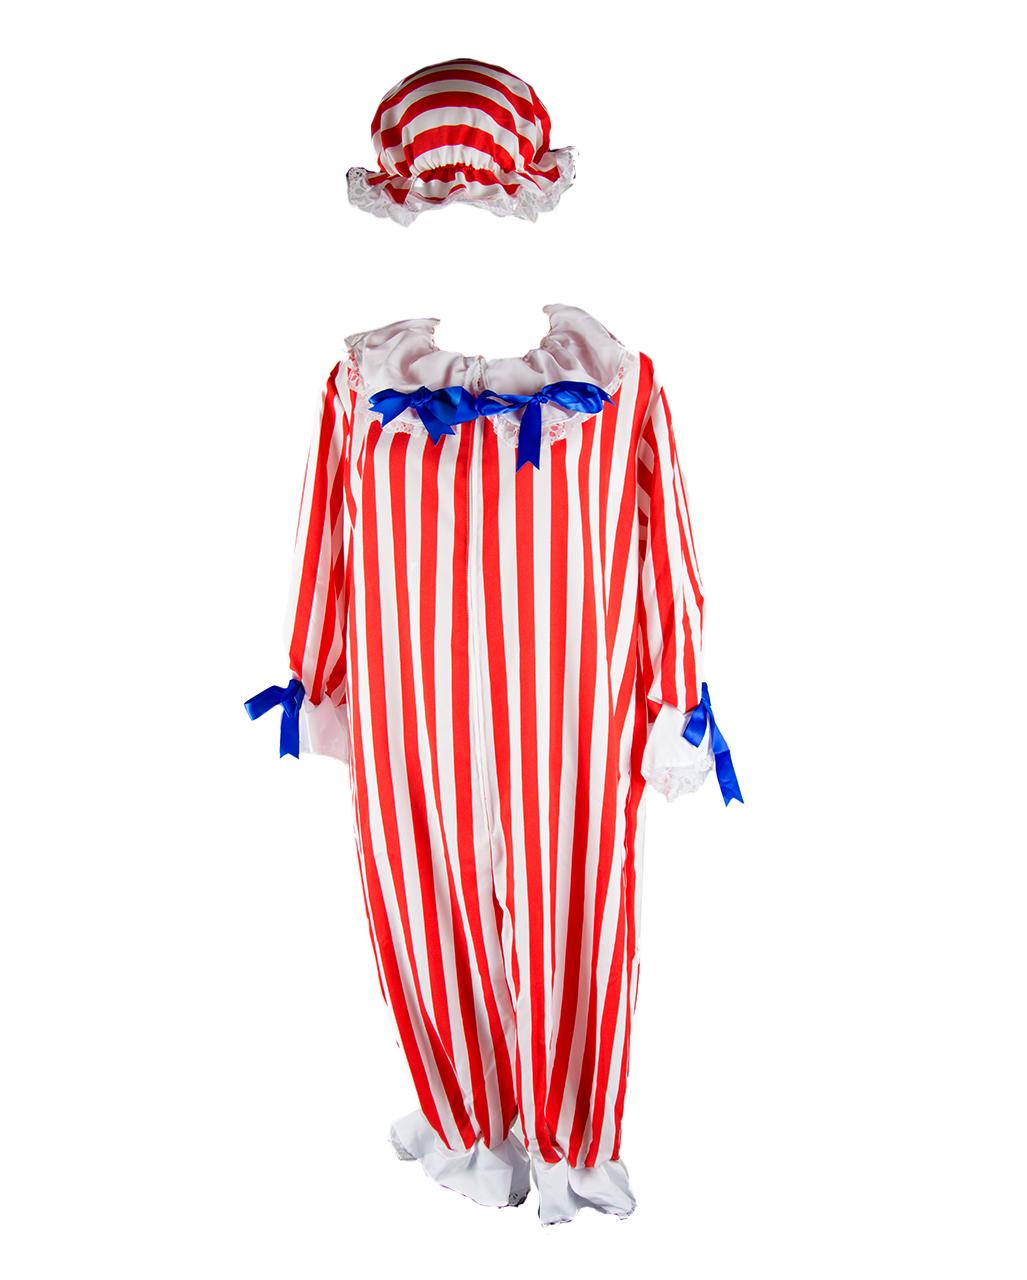 Badeanzug für Männer  Gestreiftes Badkleid-Kostüm S / 50